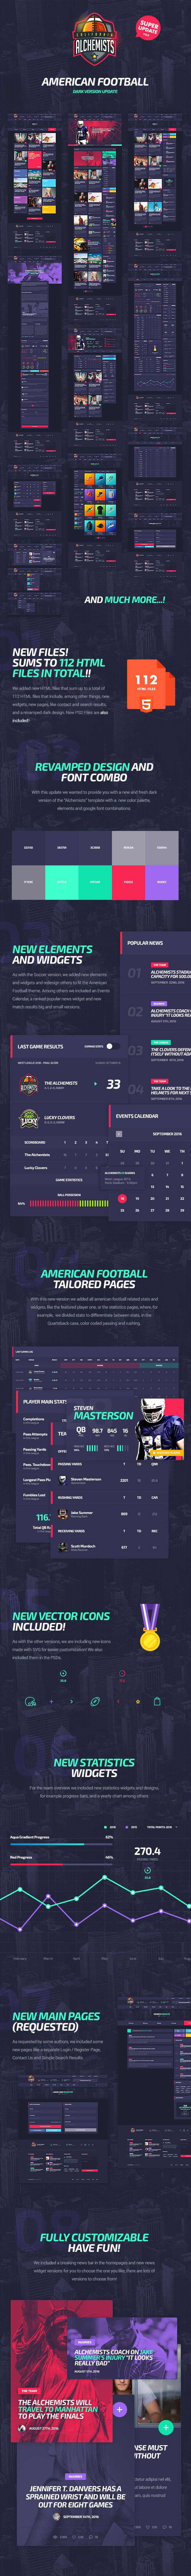 The Alchemists American Football